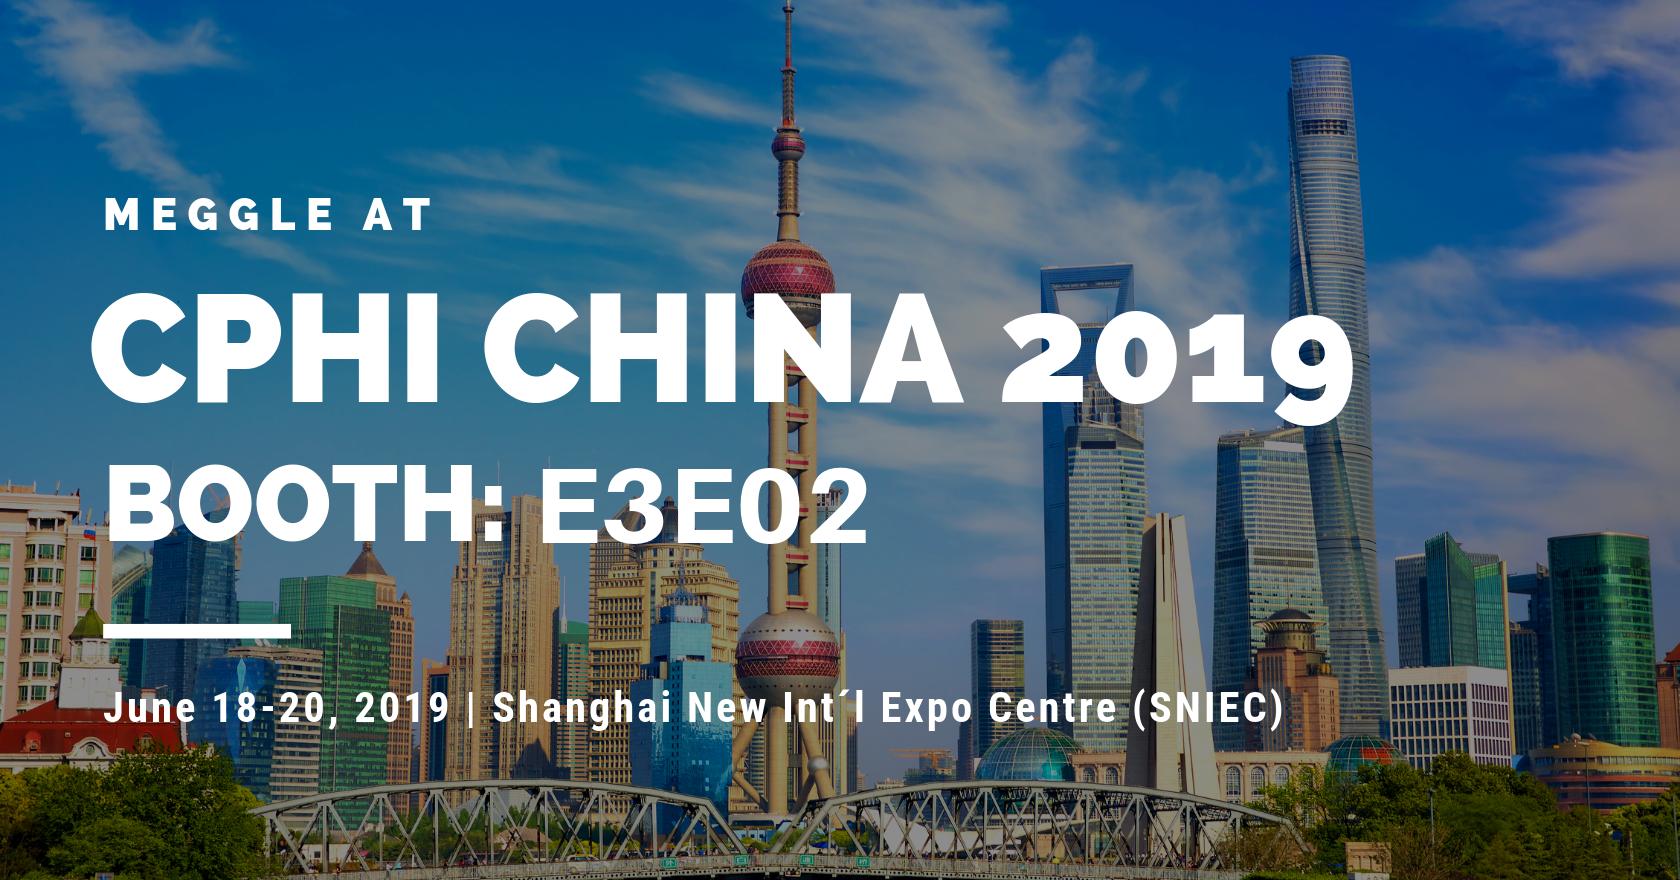 MEGGLE_CPhI_China 2019 (2)